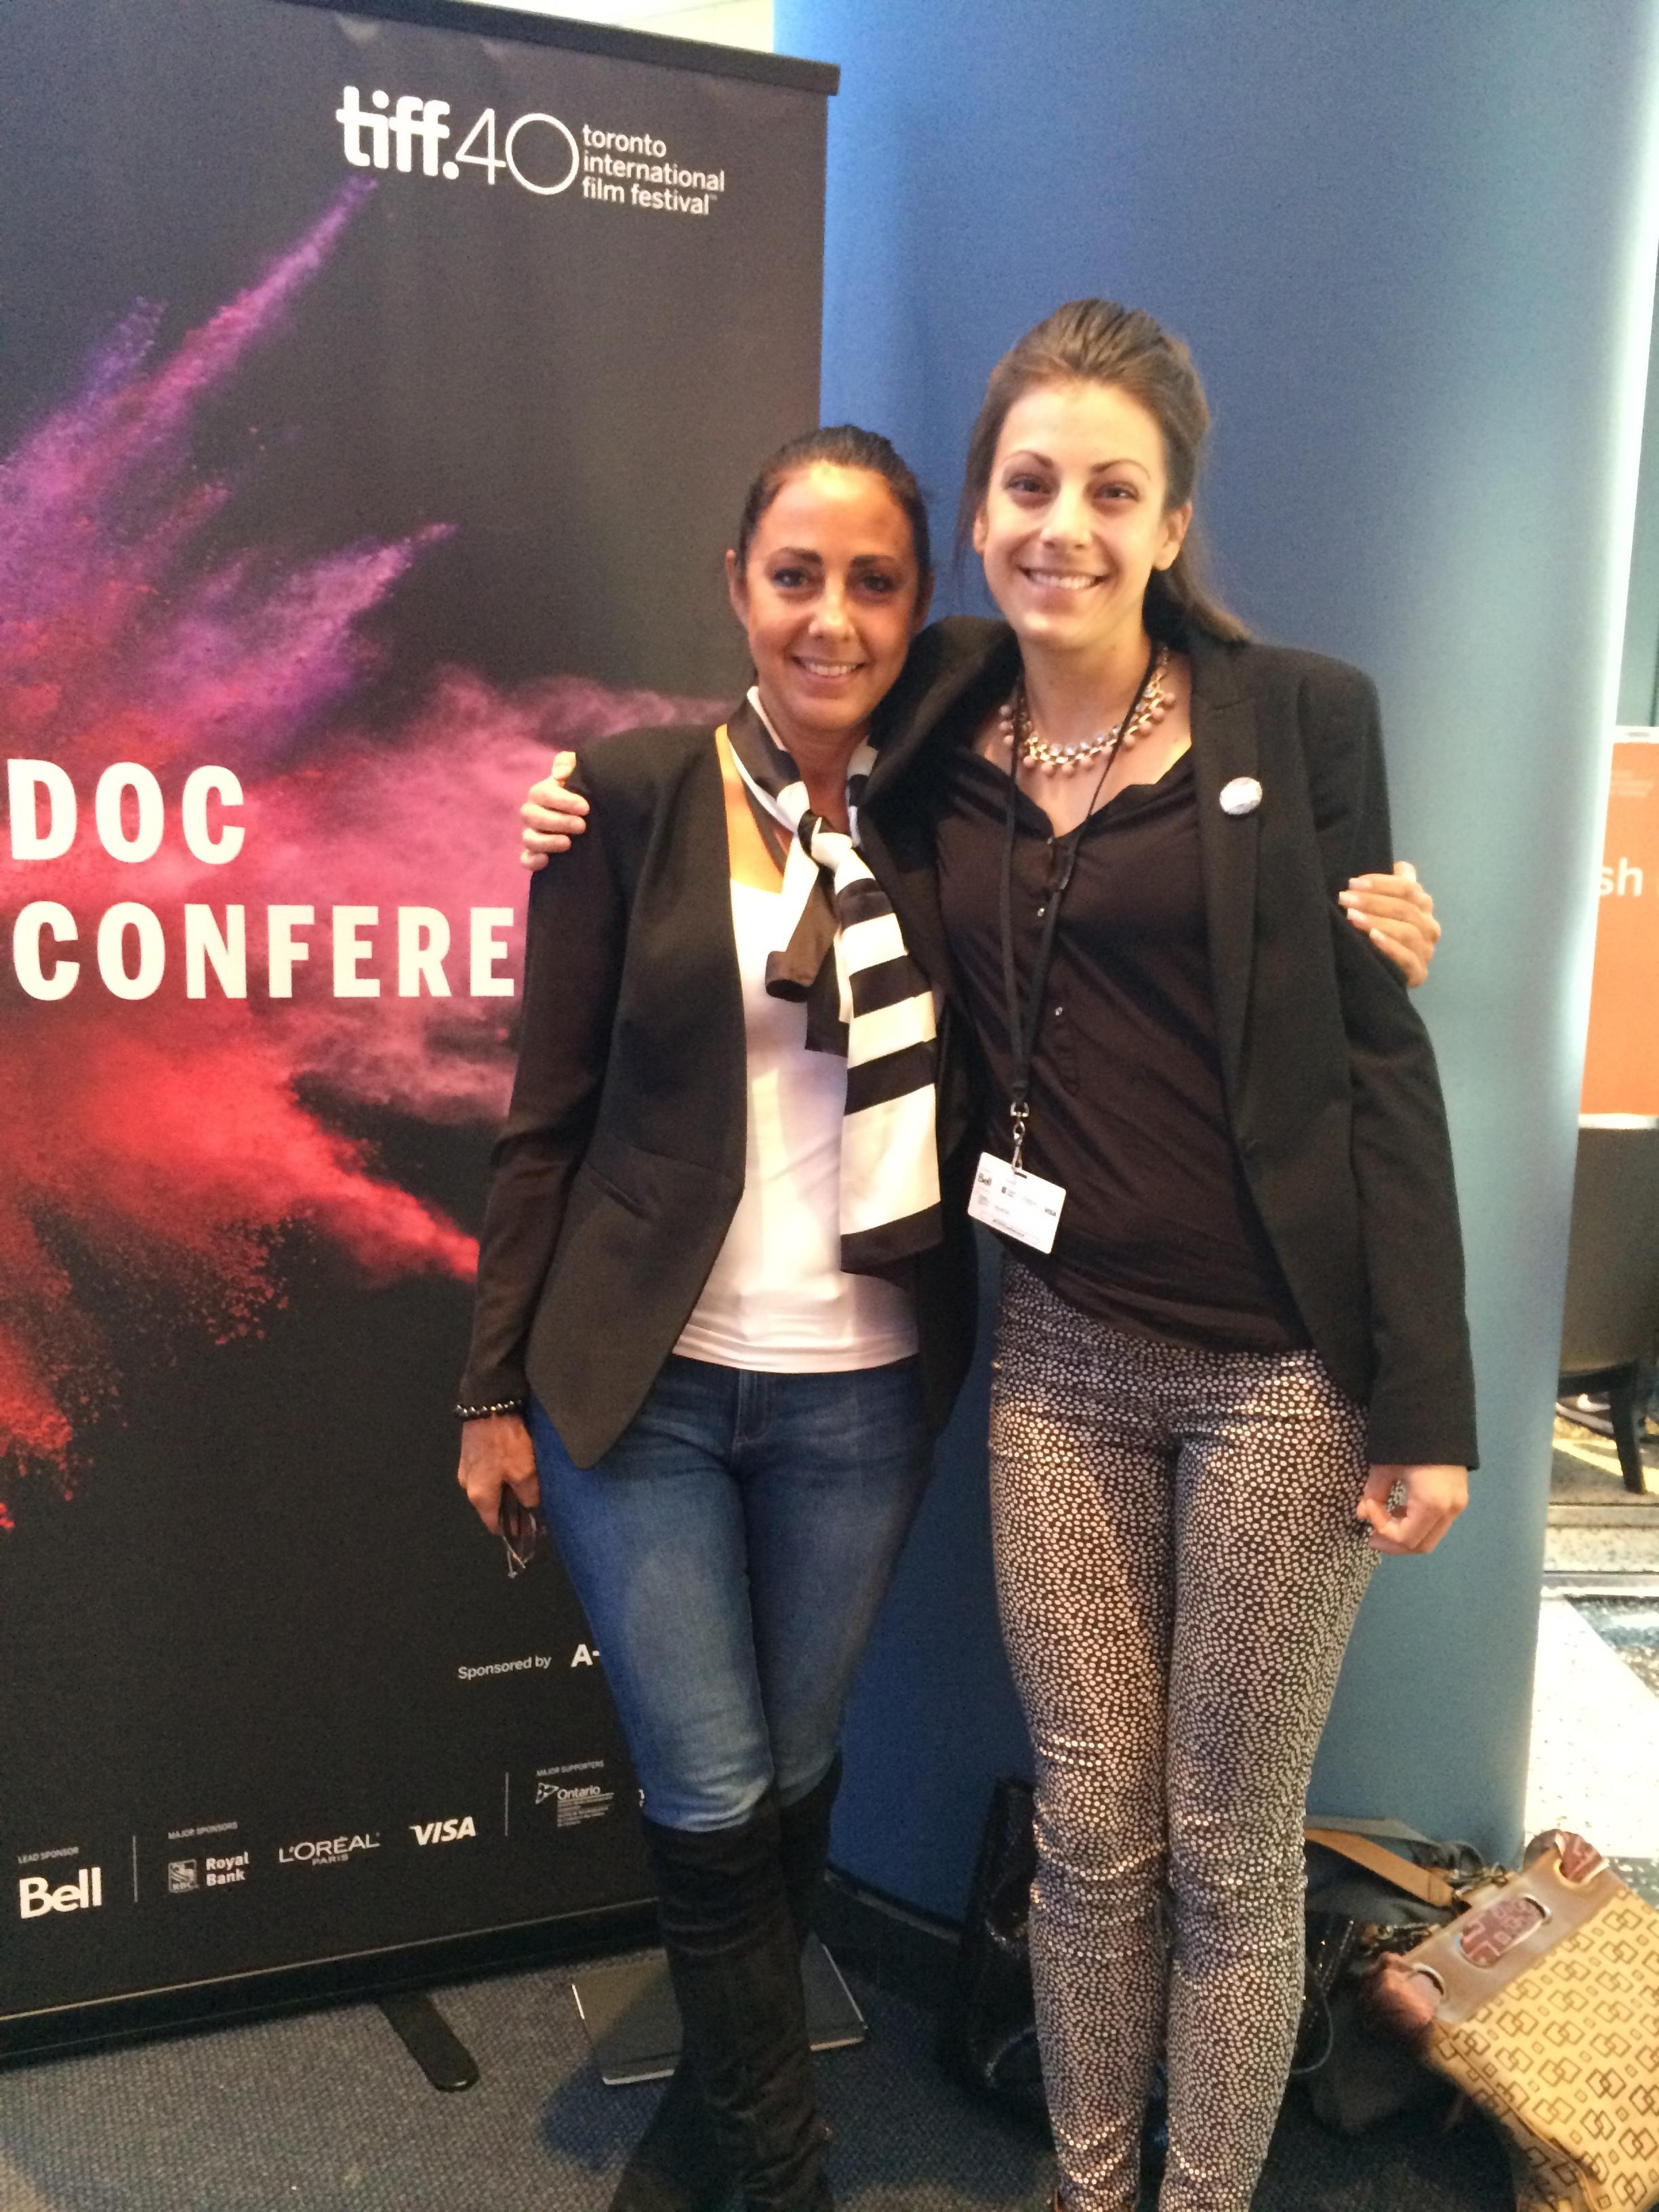 Angela Barnhardt Thomas and Me at TIFF 2015